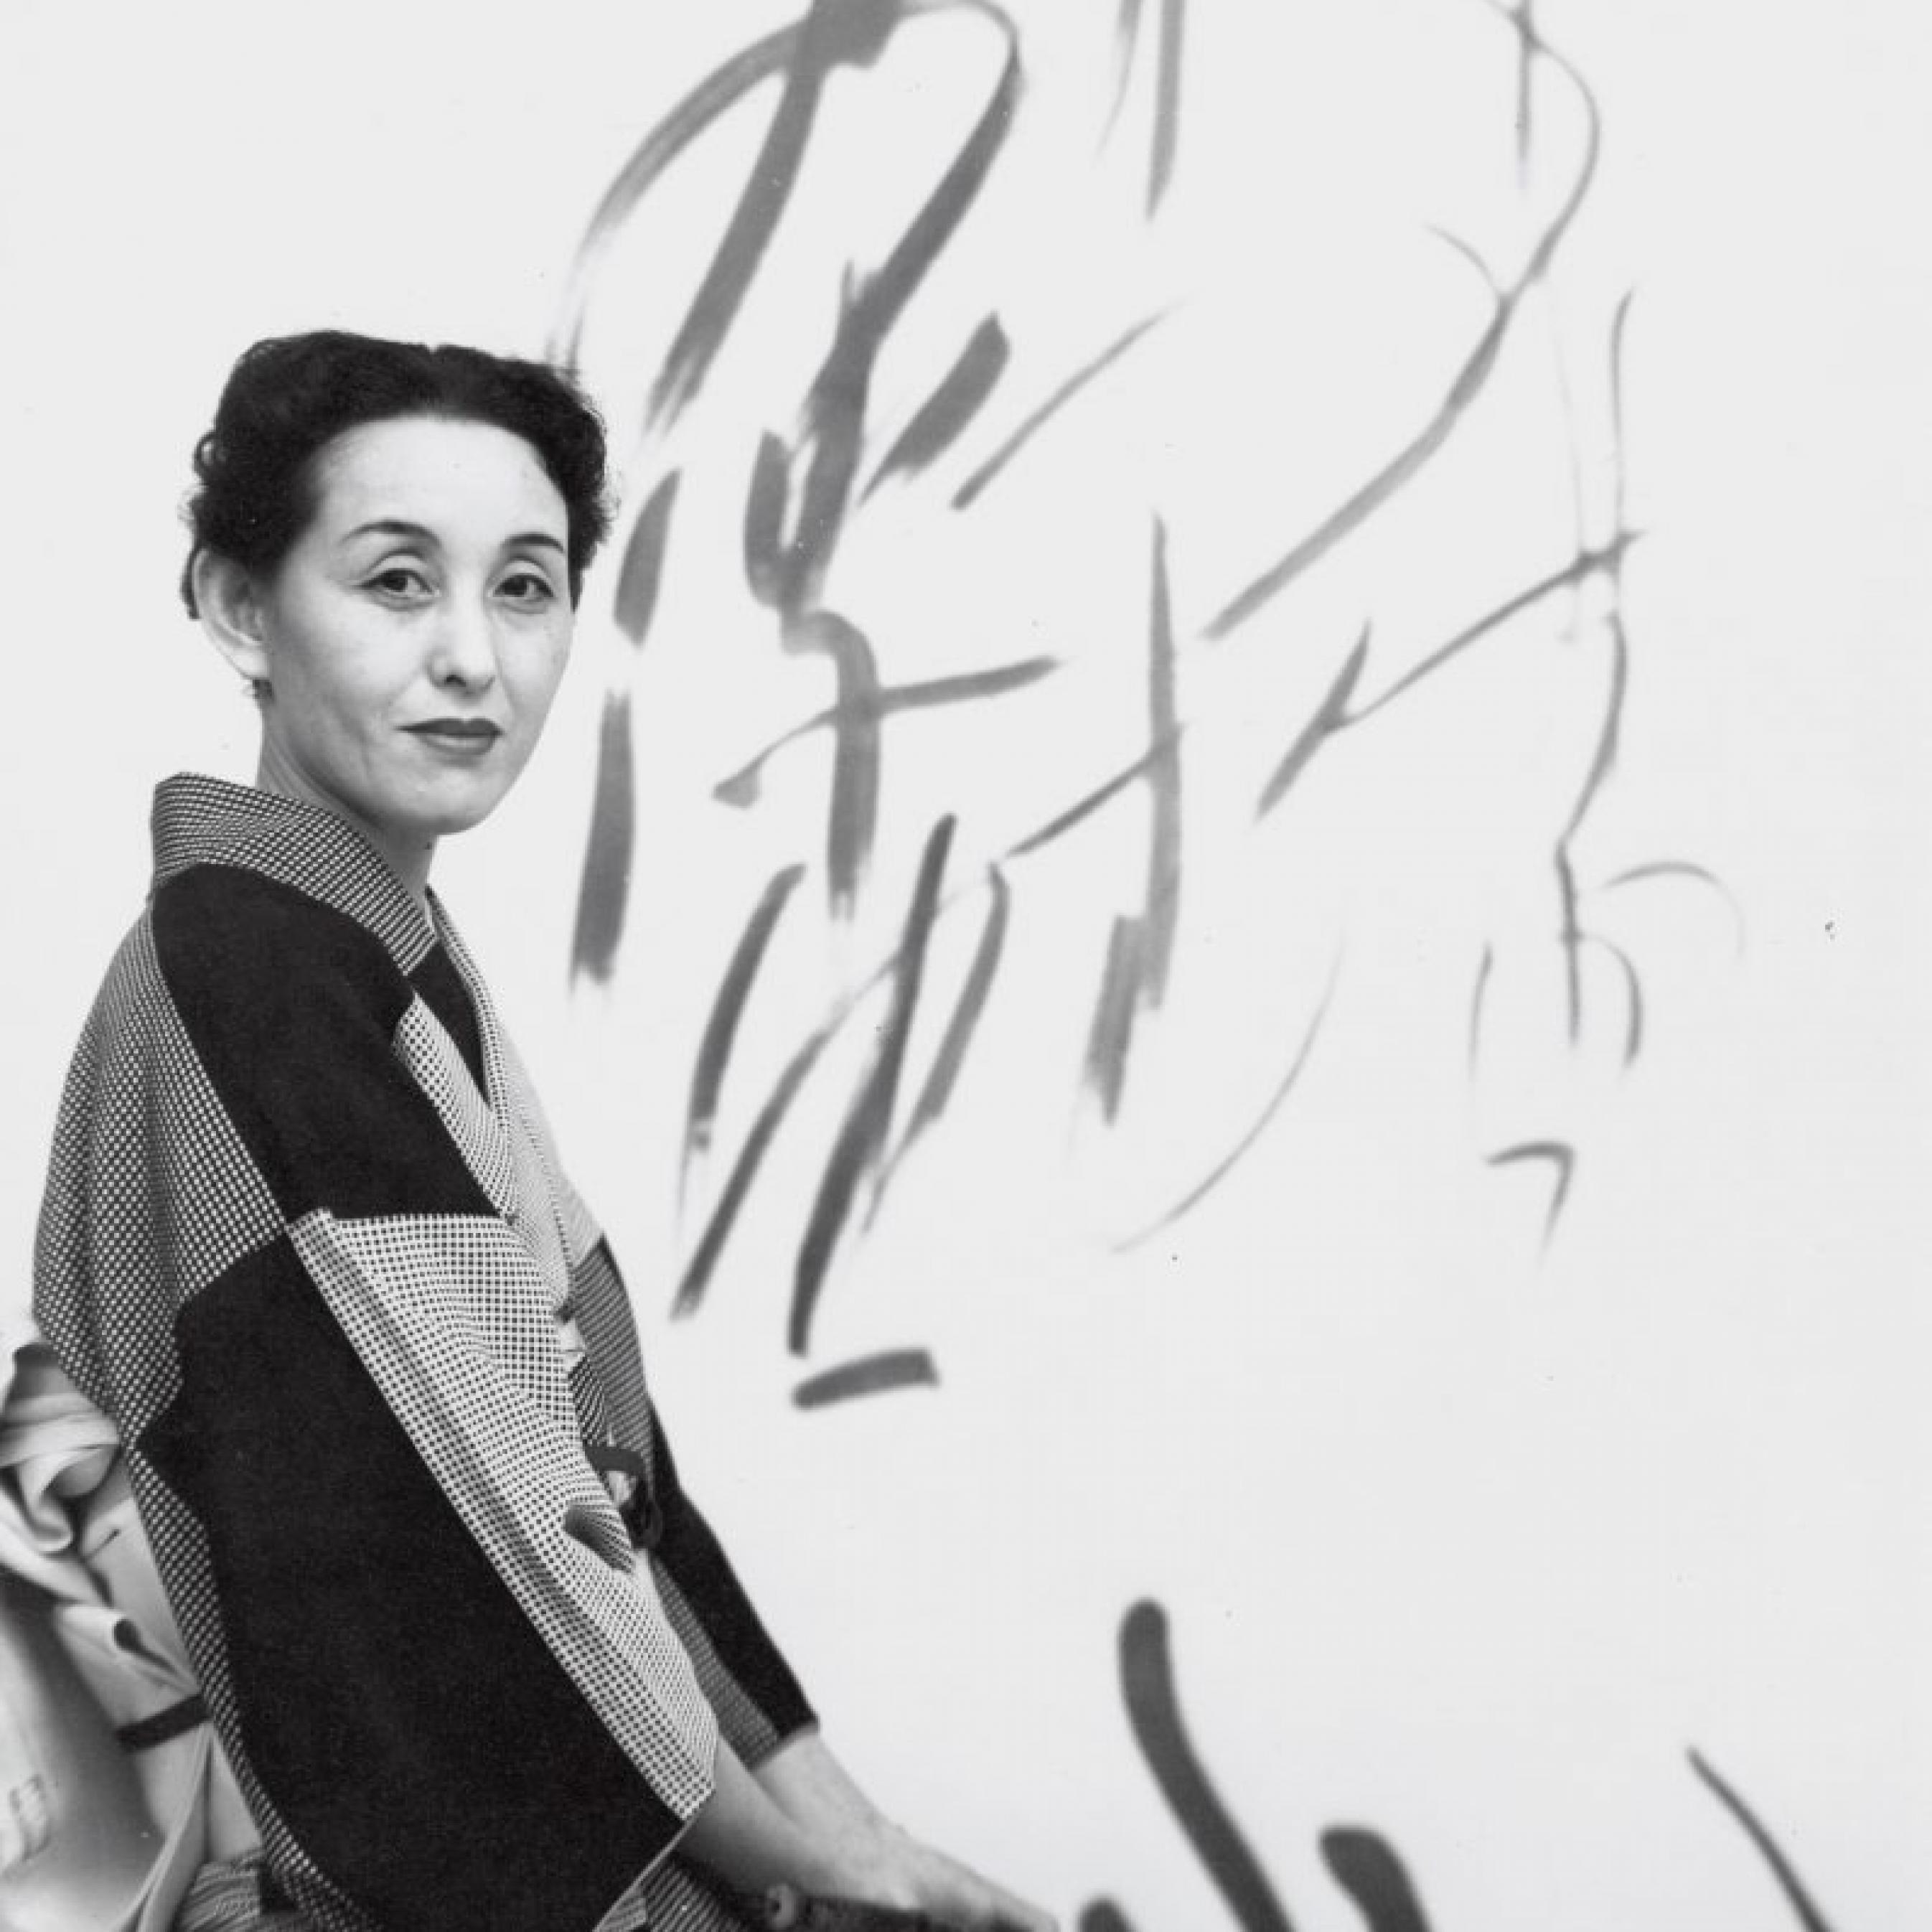 the-traditional-iconoclast-artist-toko-shinoda